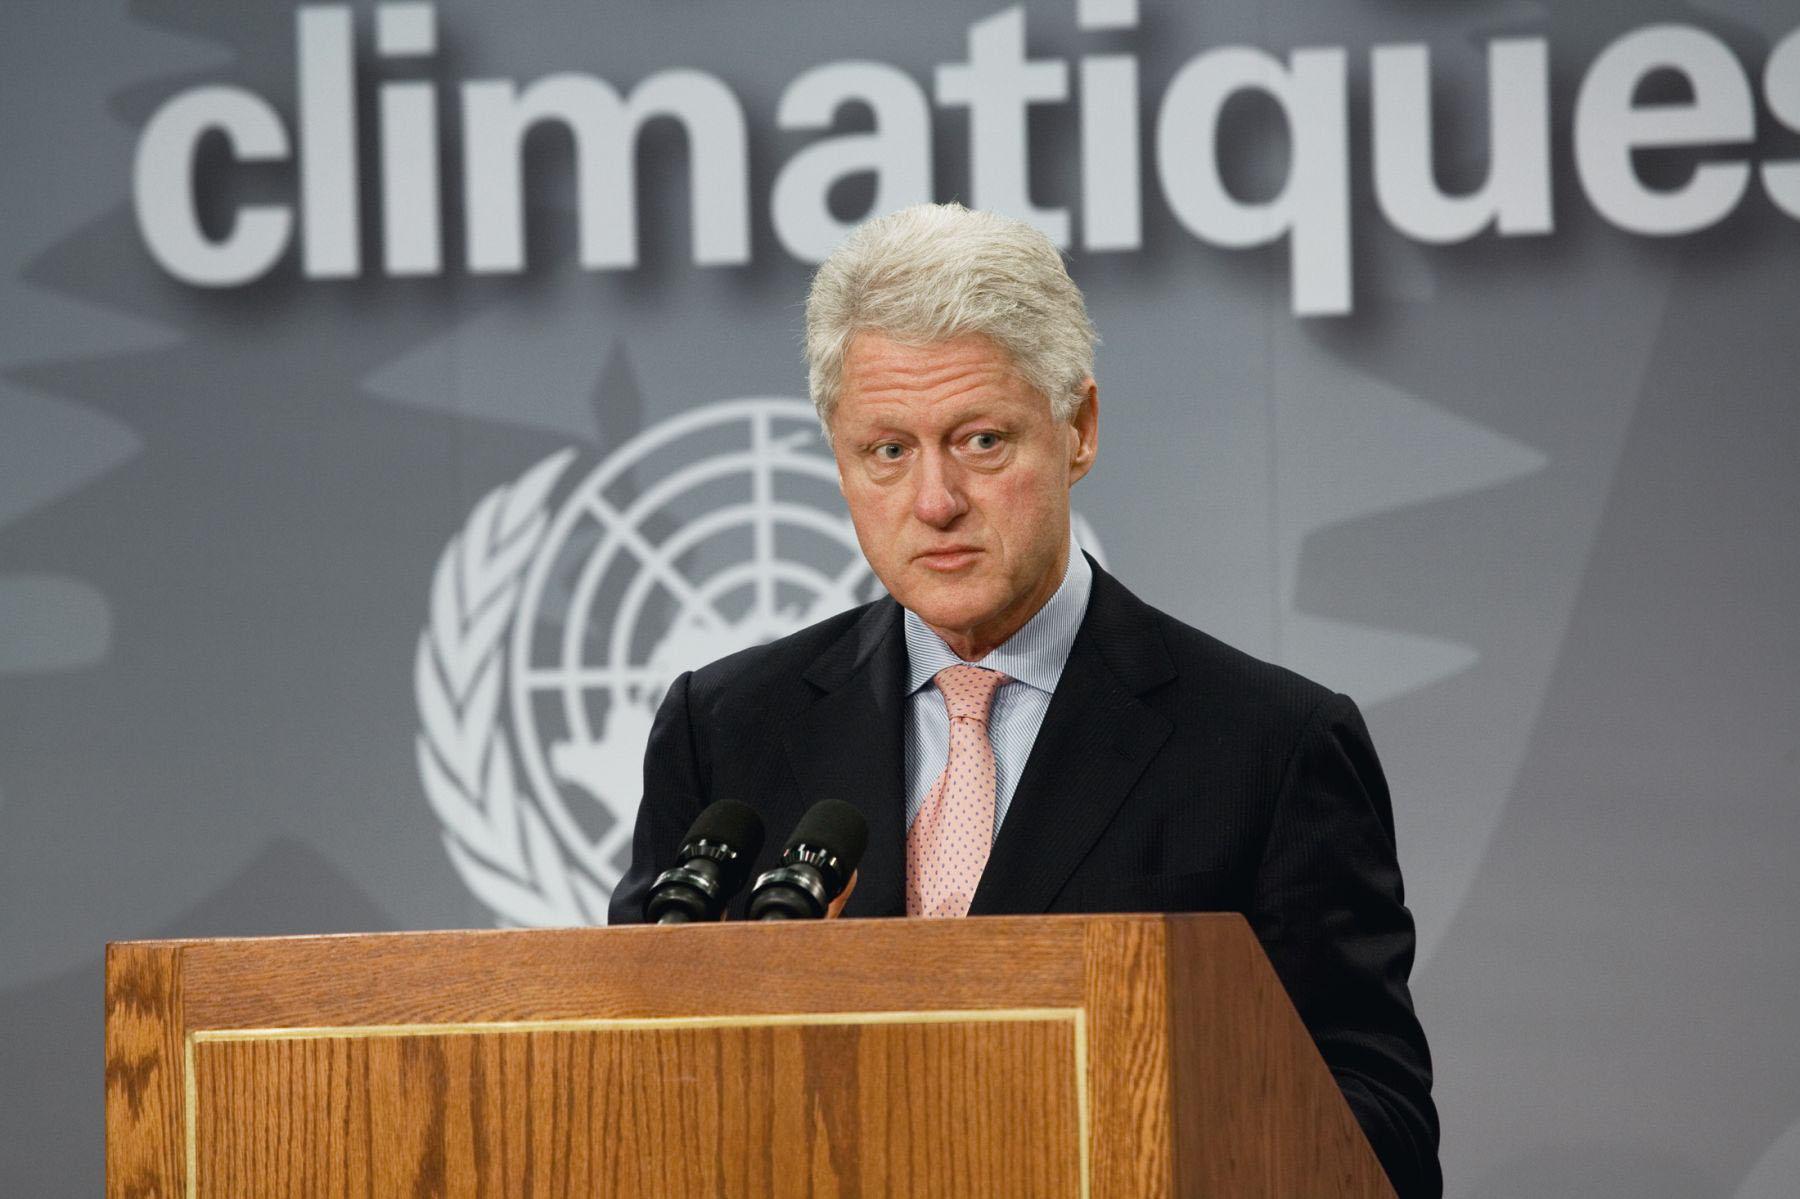 William J. Clinton, Former President, United States, 2005